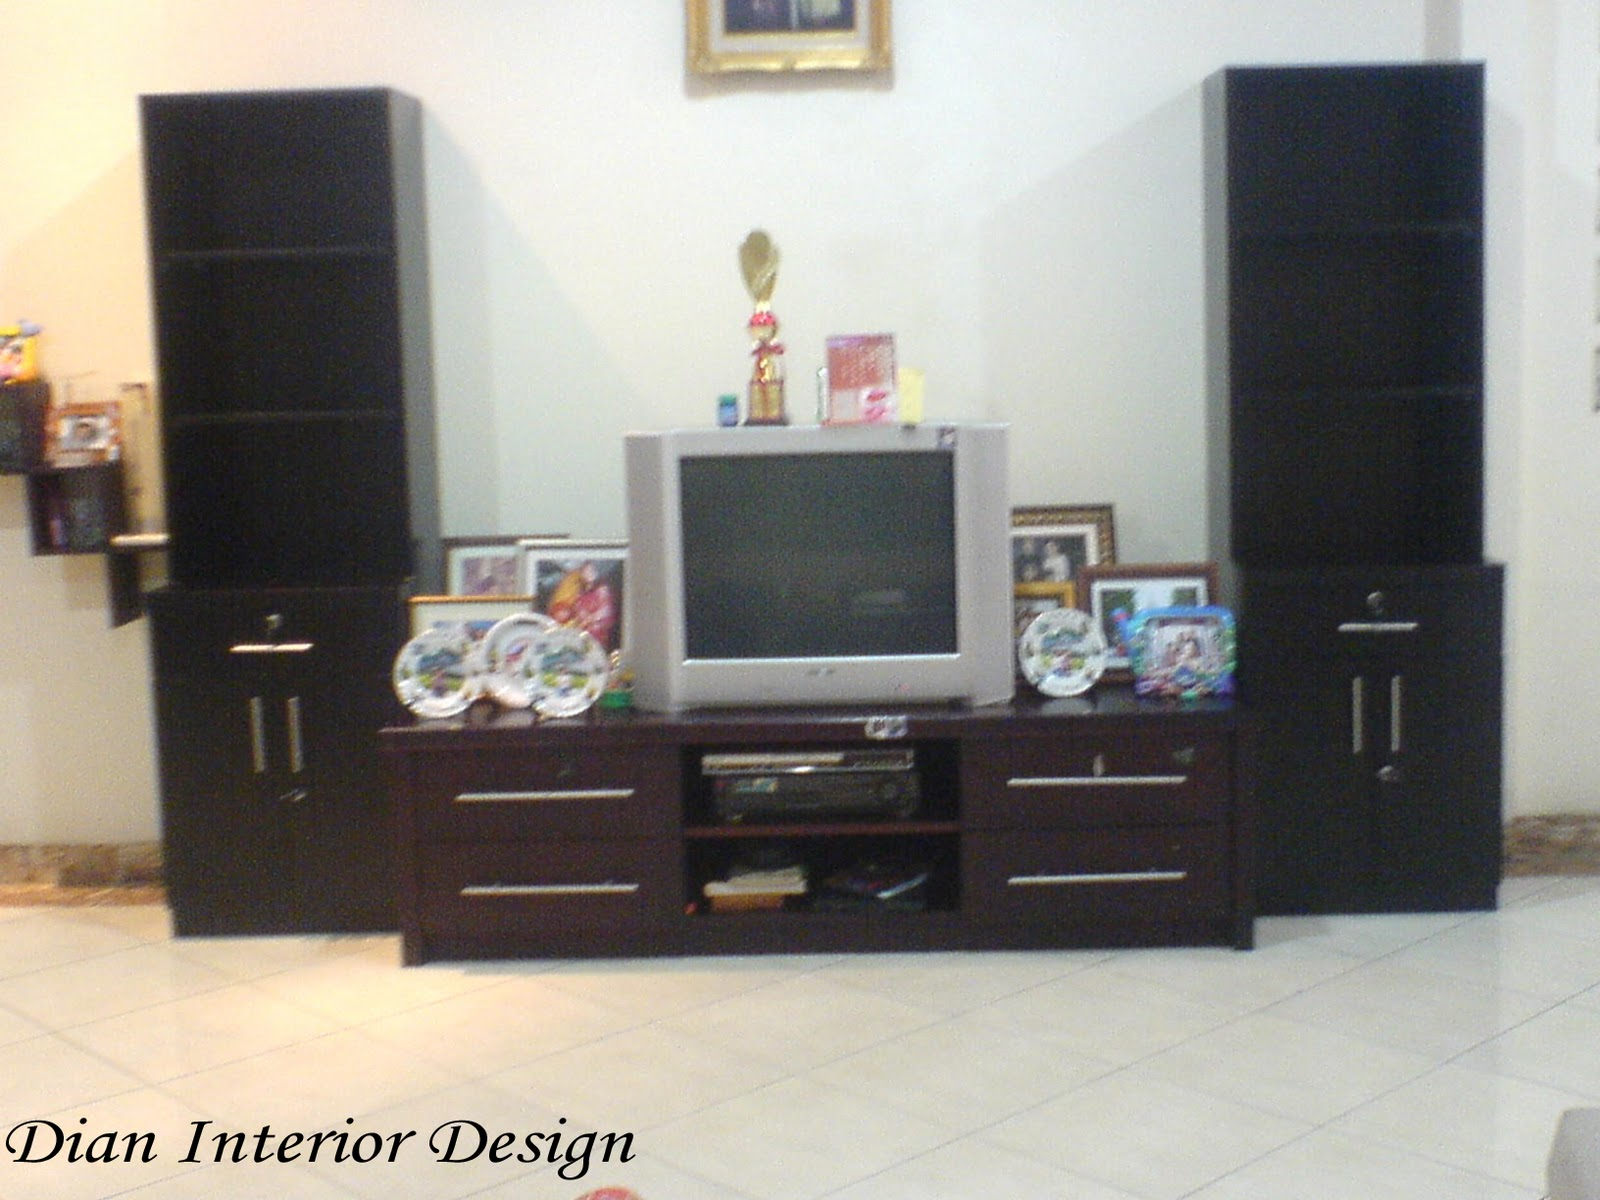 Rak Tv Rak Pajang Minimalis Dian Interior Design